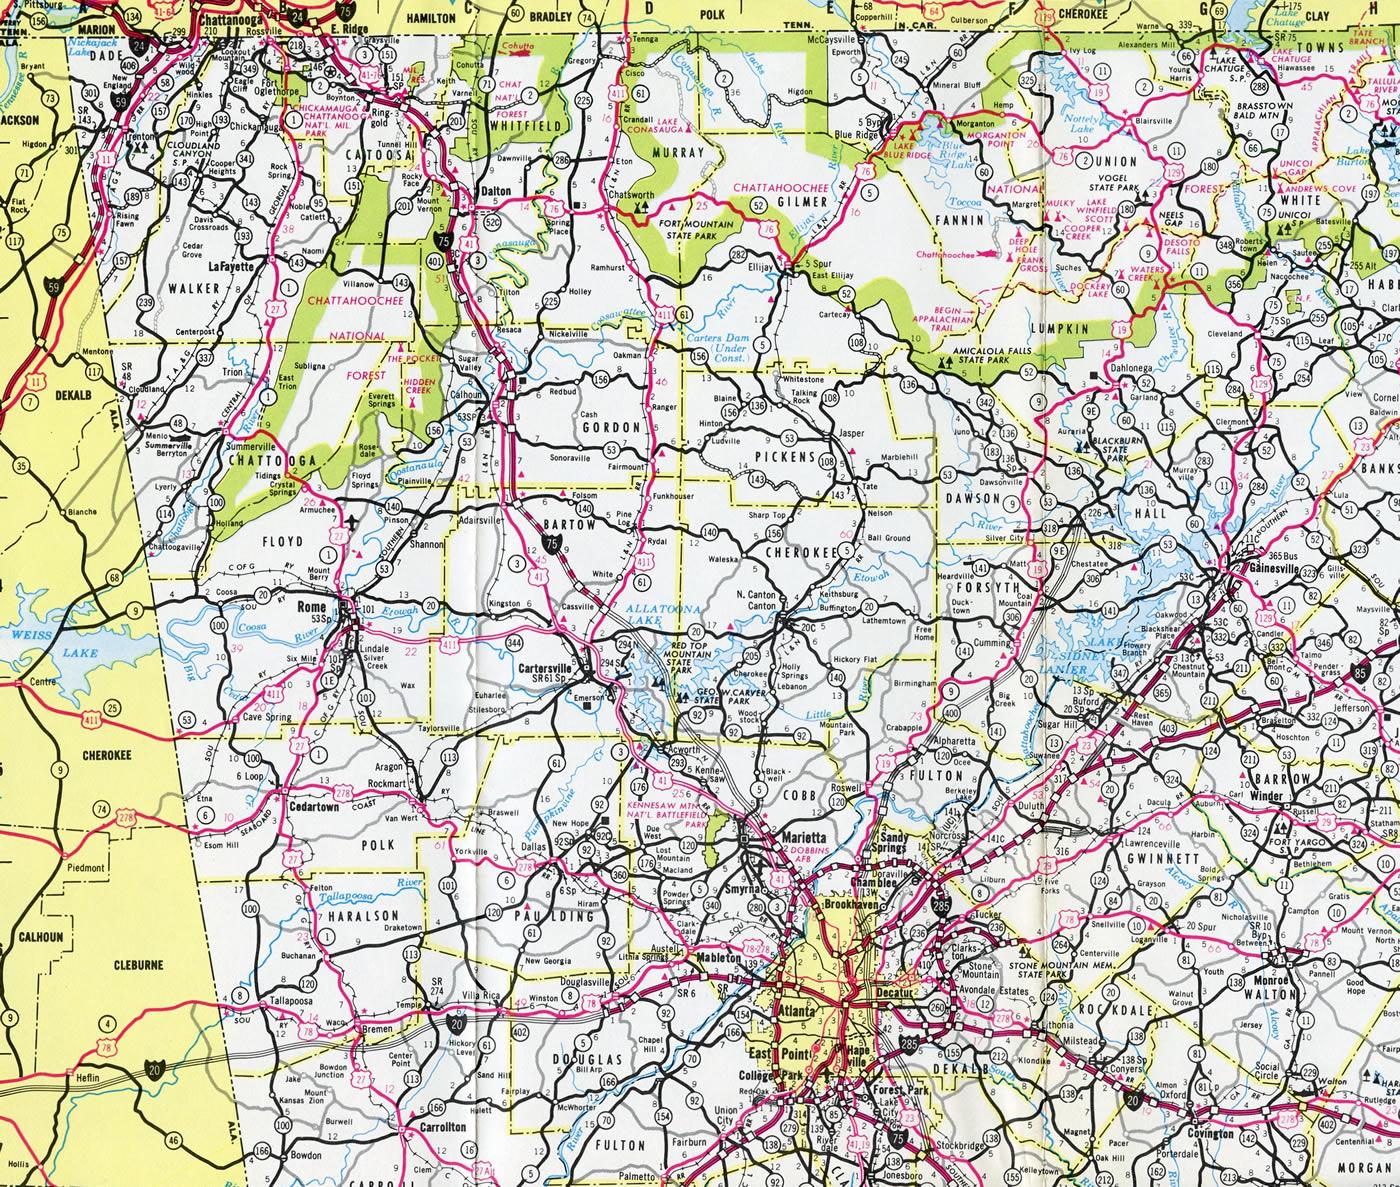 Map Of Georgia 75.Interstate 75 Aaroads Georgia